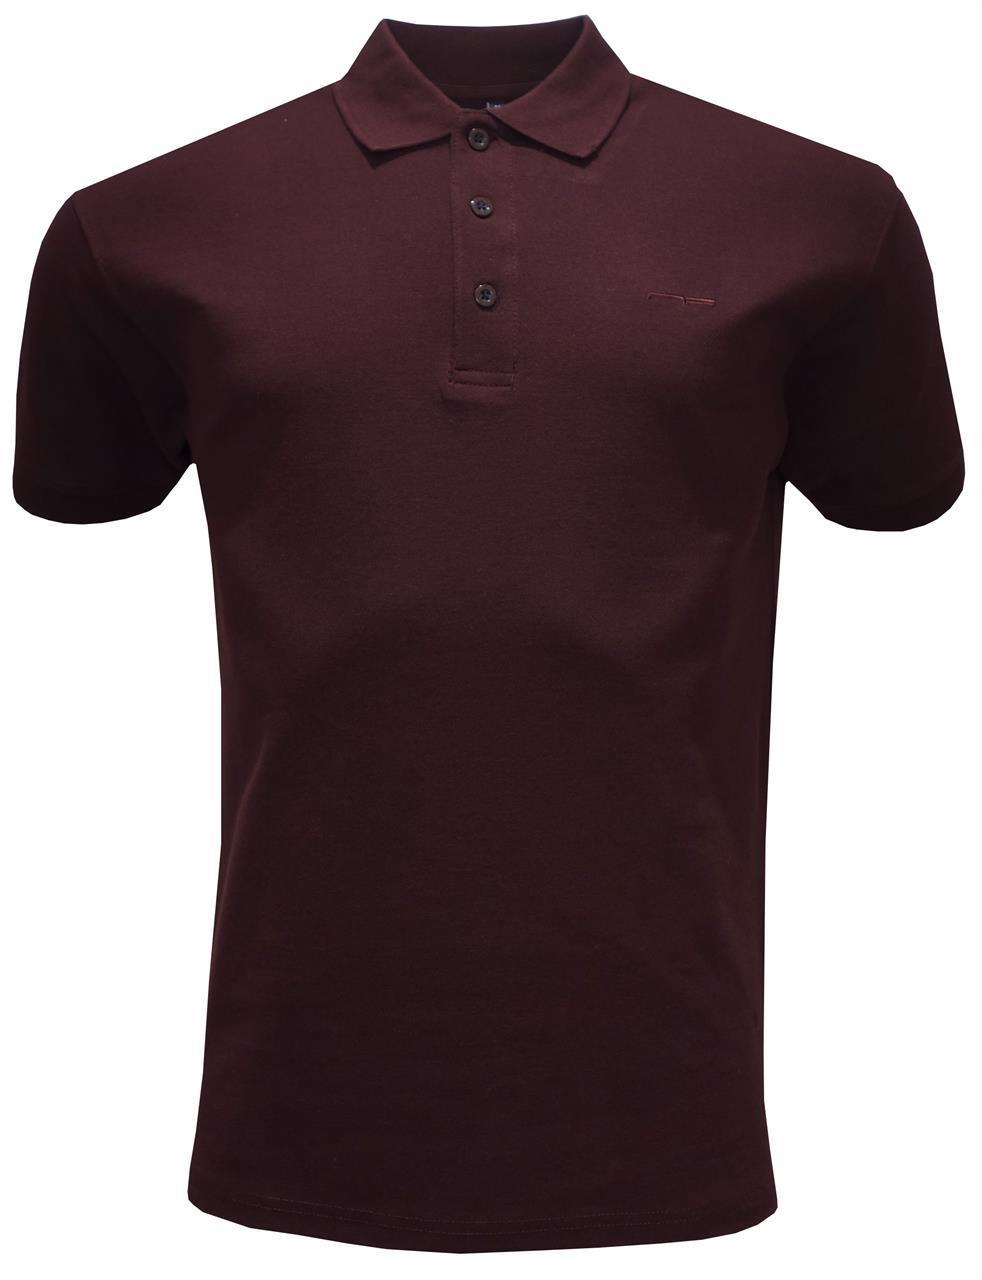 Shirt 1673 Plum M